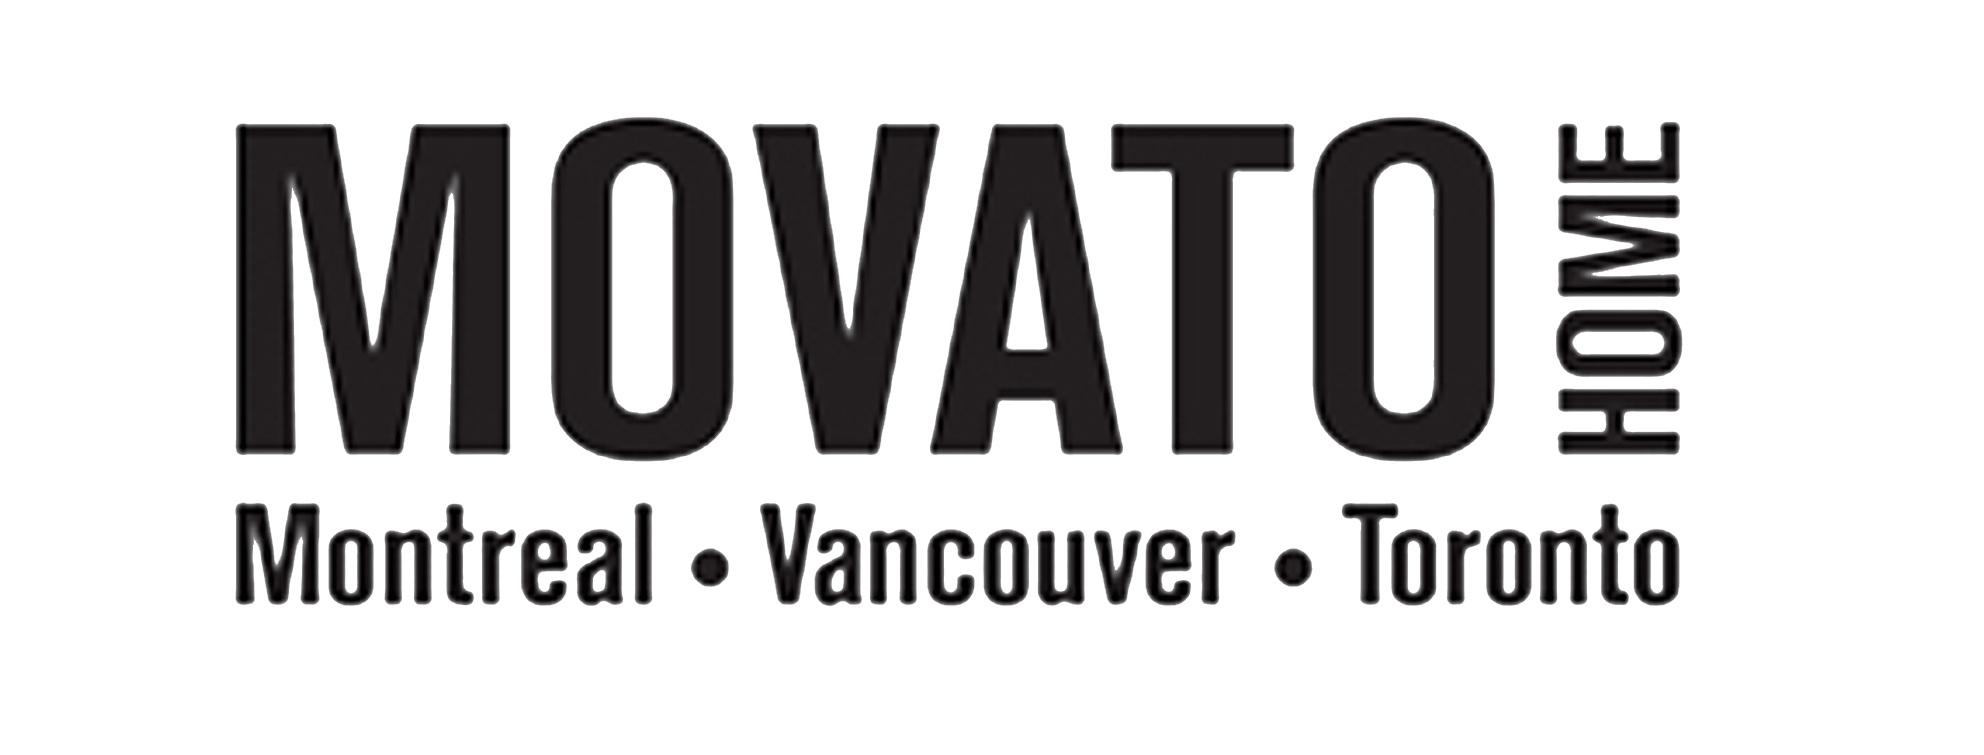 movato-logo.jpg